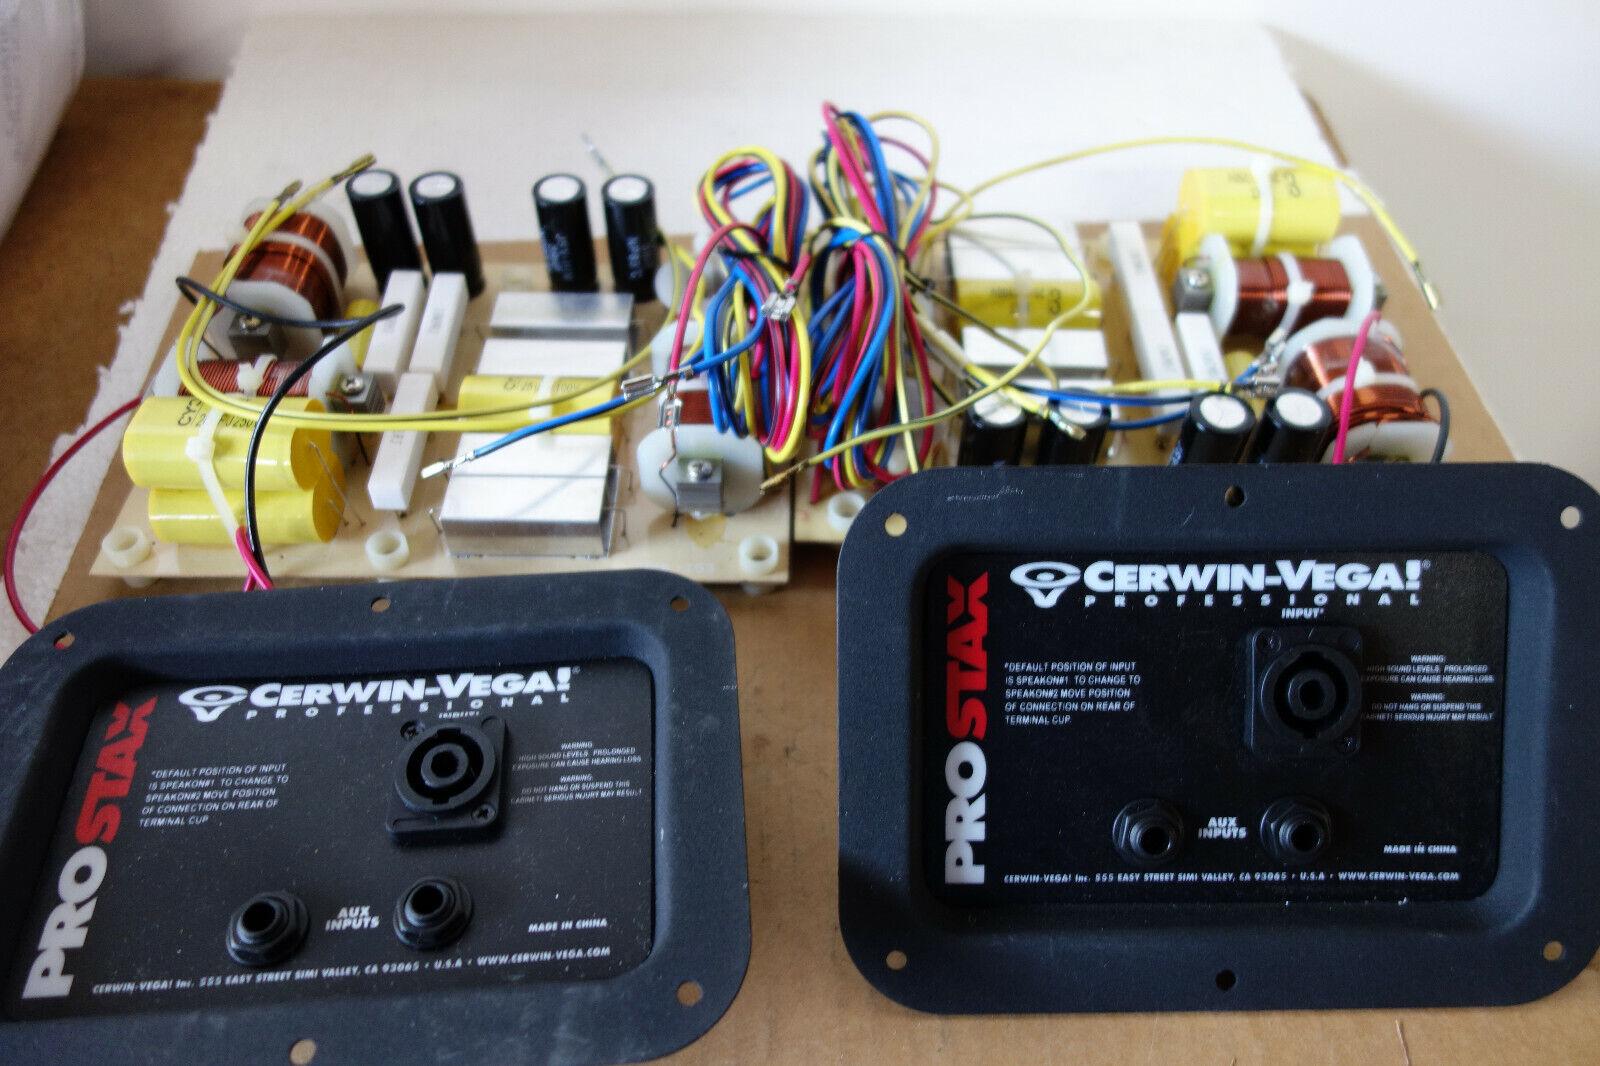 Pair 2 Pcs Cerwin Vega PX-153 Pro Stax 3 Way Crossover